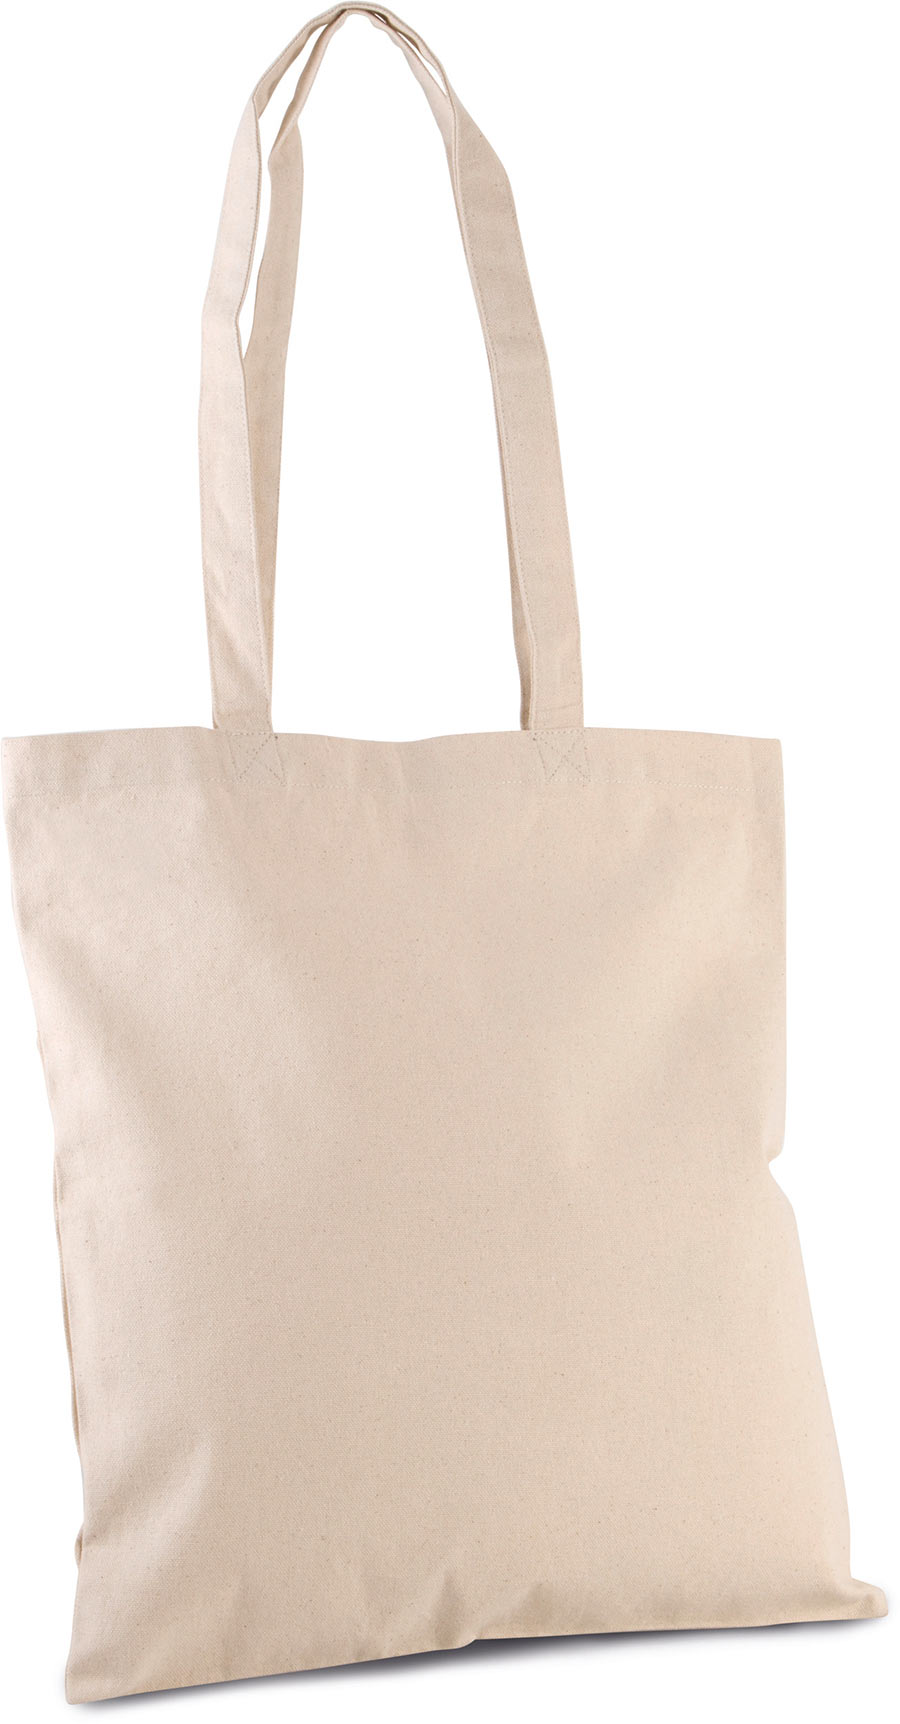 Kimood KI0262 Classic Shopper Organic Cotton